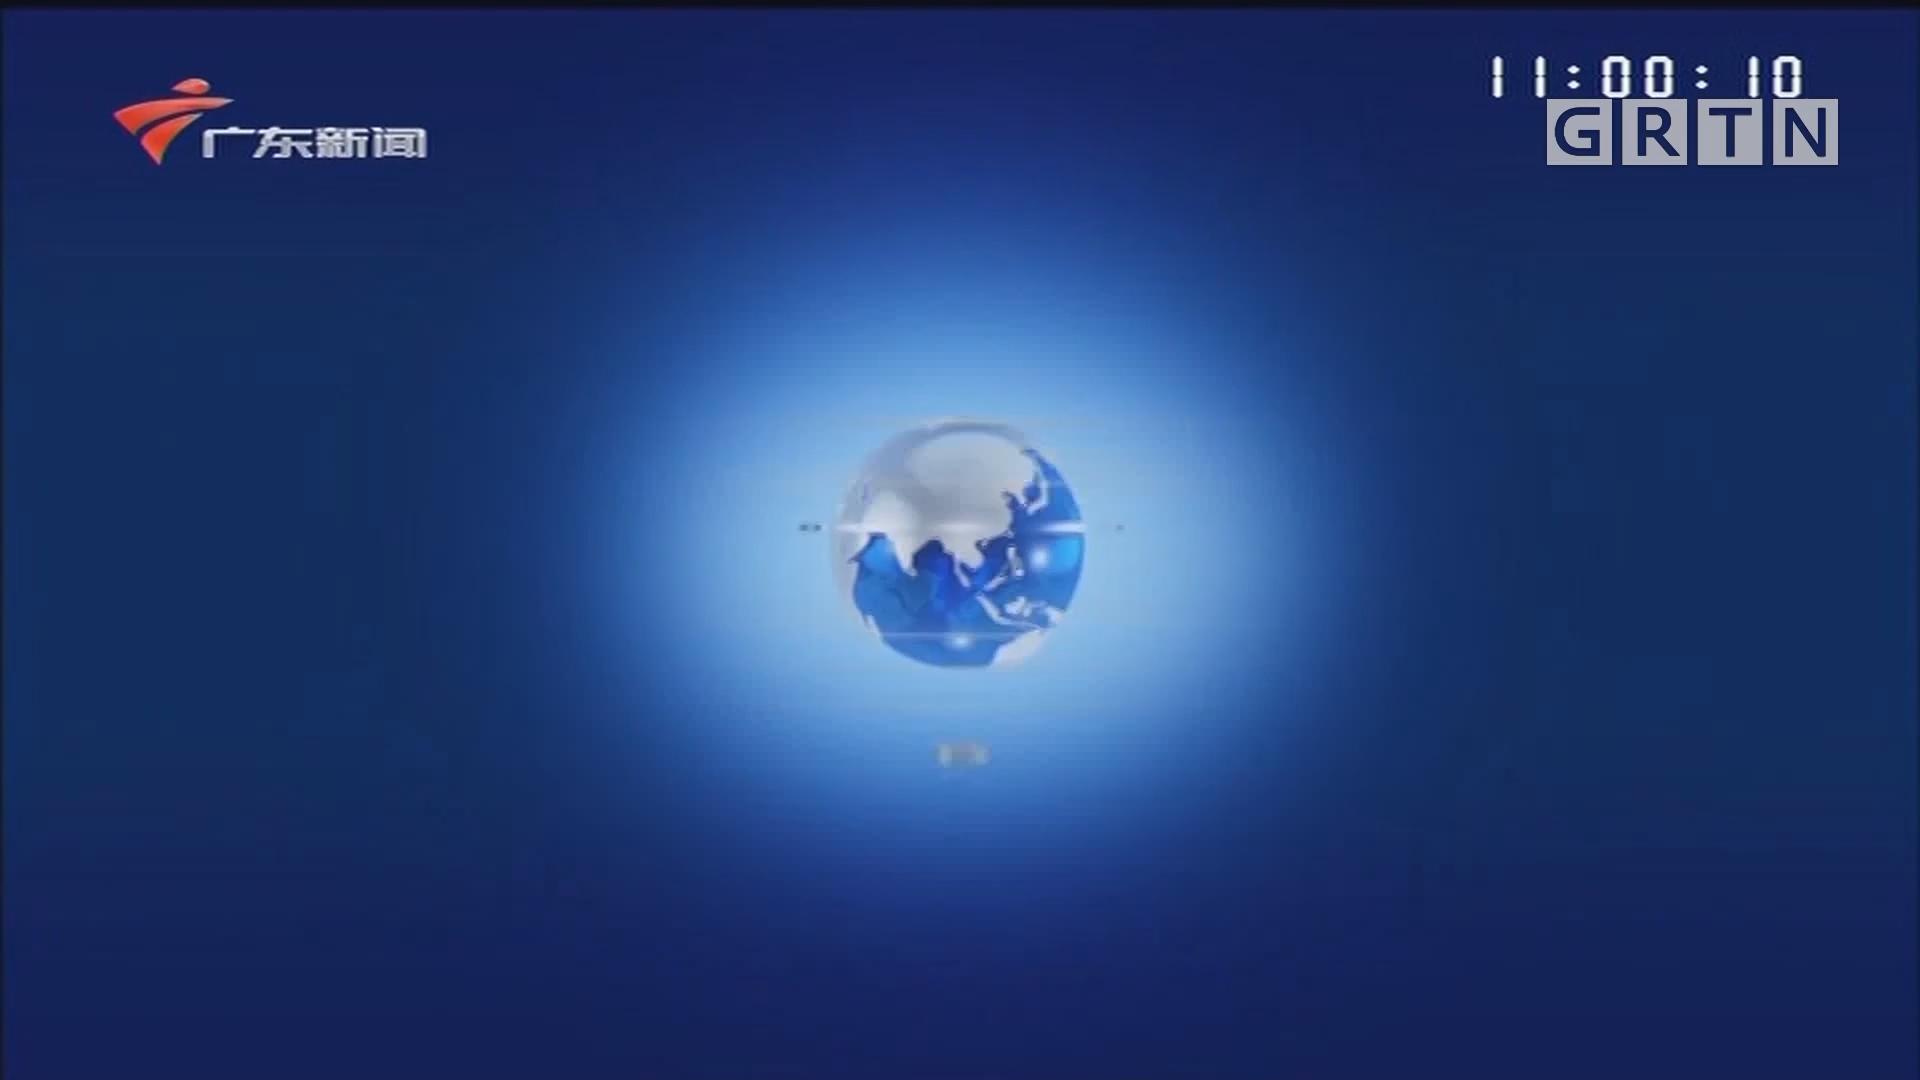 [HD][2020-02-21-11:00]正点播报:国家医保局:确保新冠肺炎患者不因费用问题影响就医